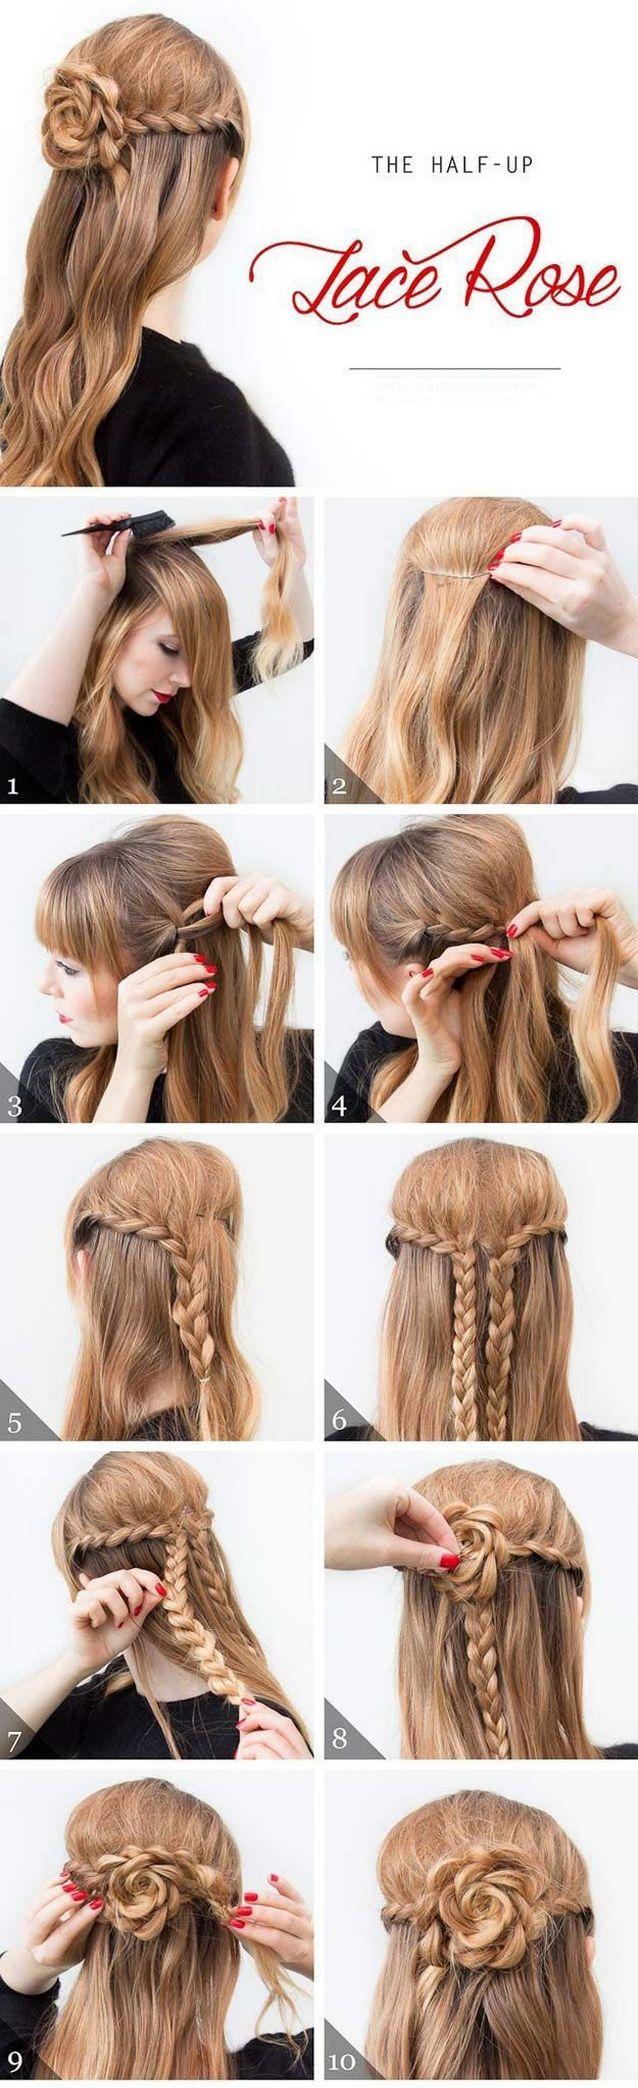 Charming DIY Lace Braid Hairstyle Charming DIY Lace Braid Hairstyle new foto